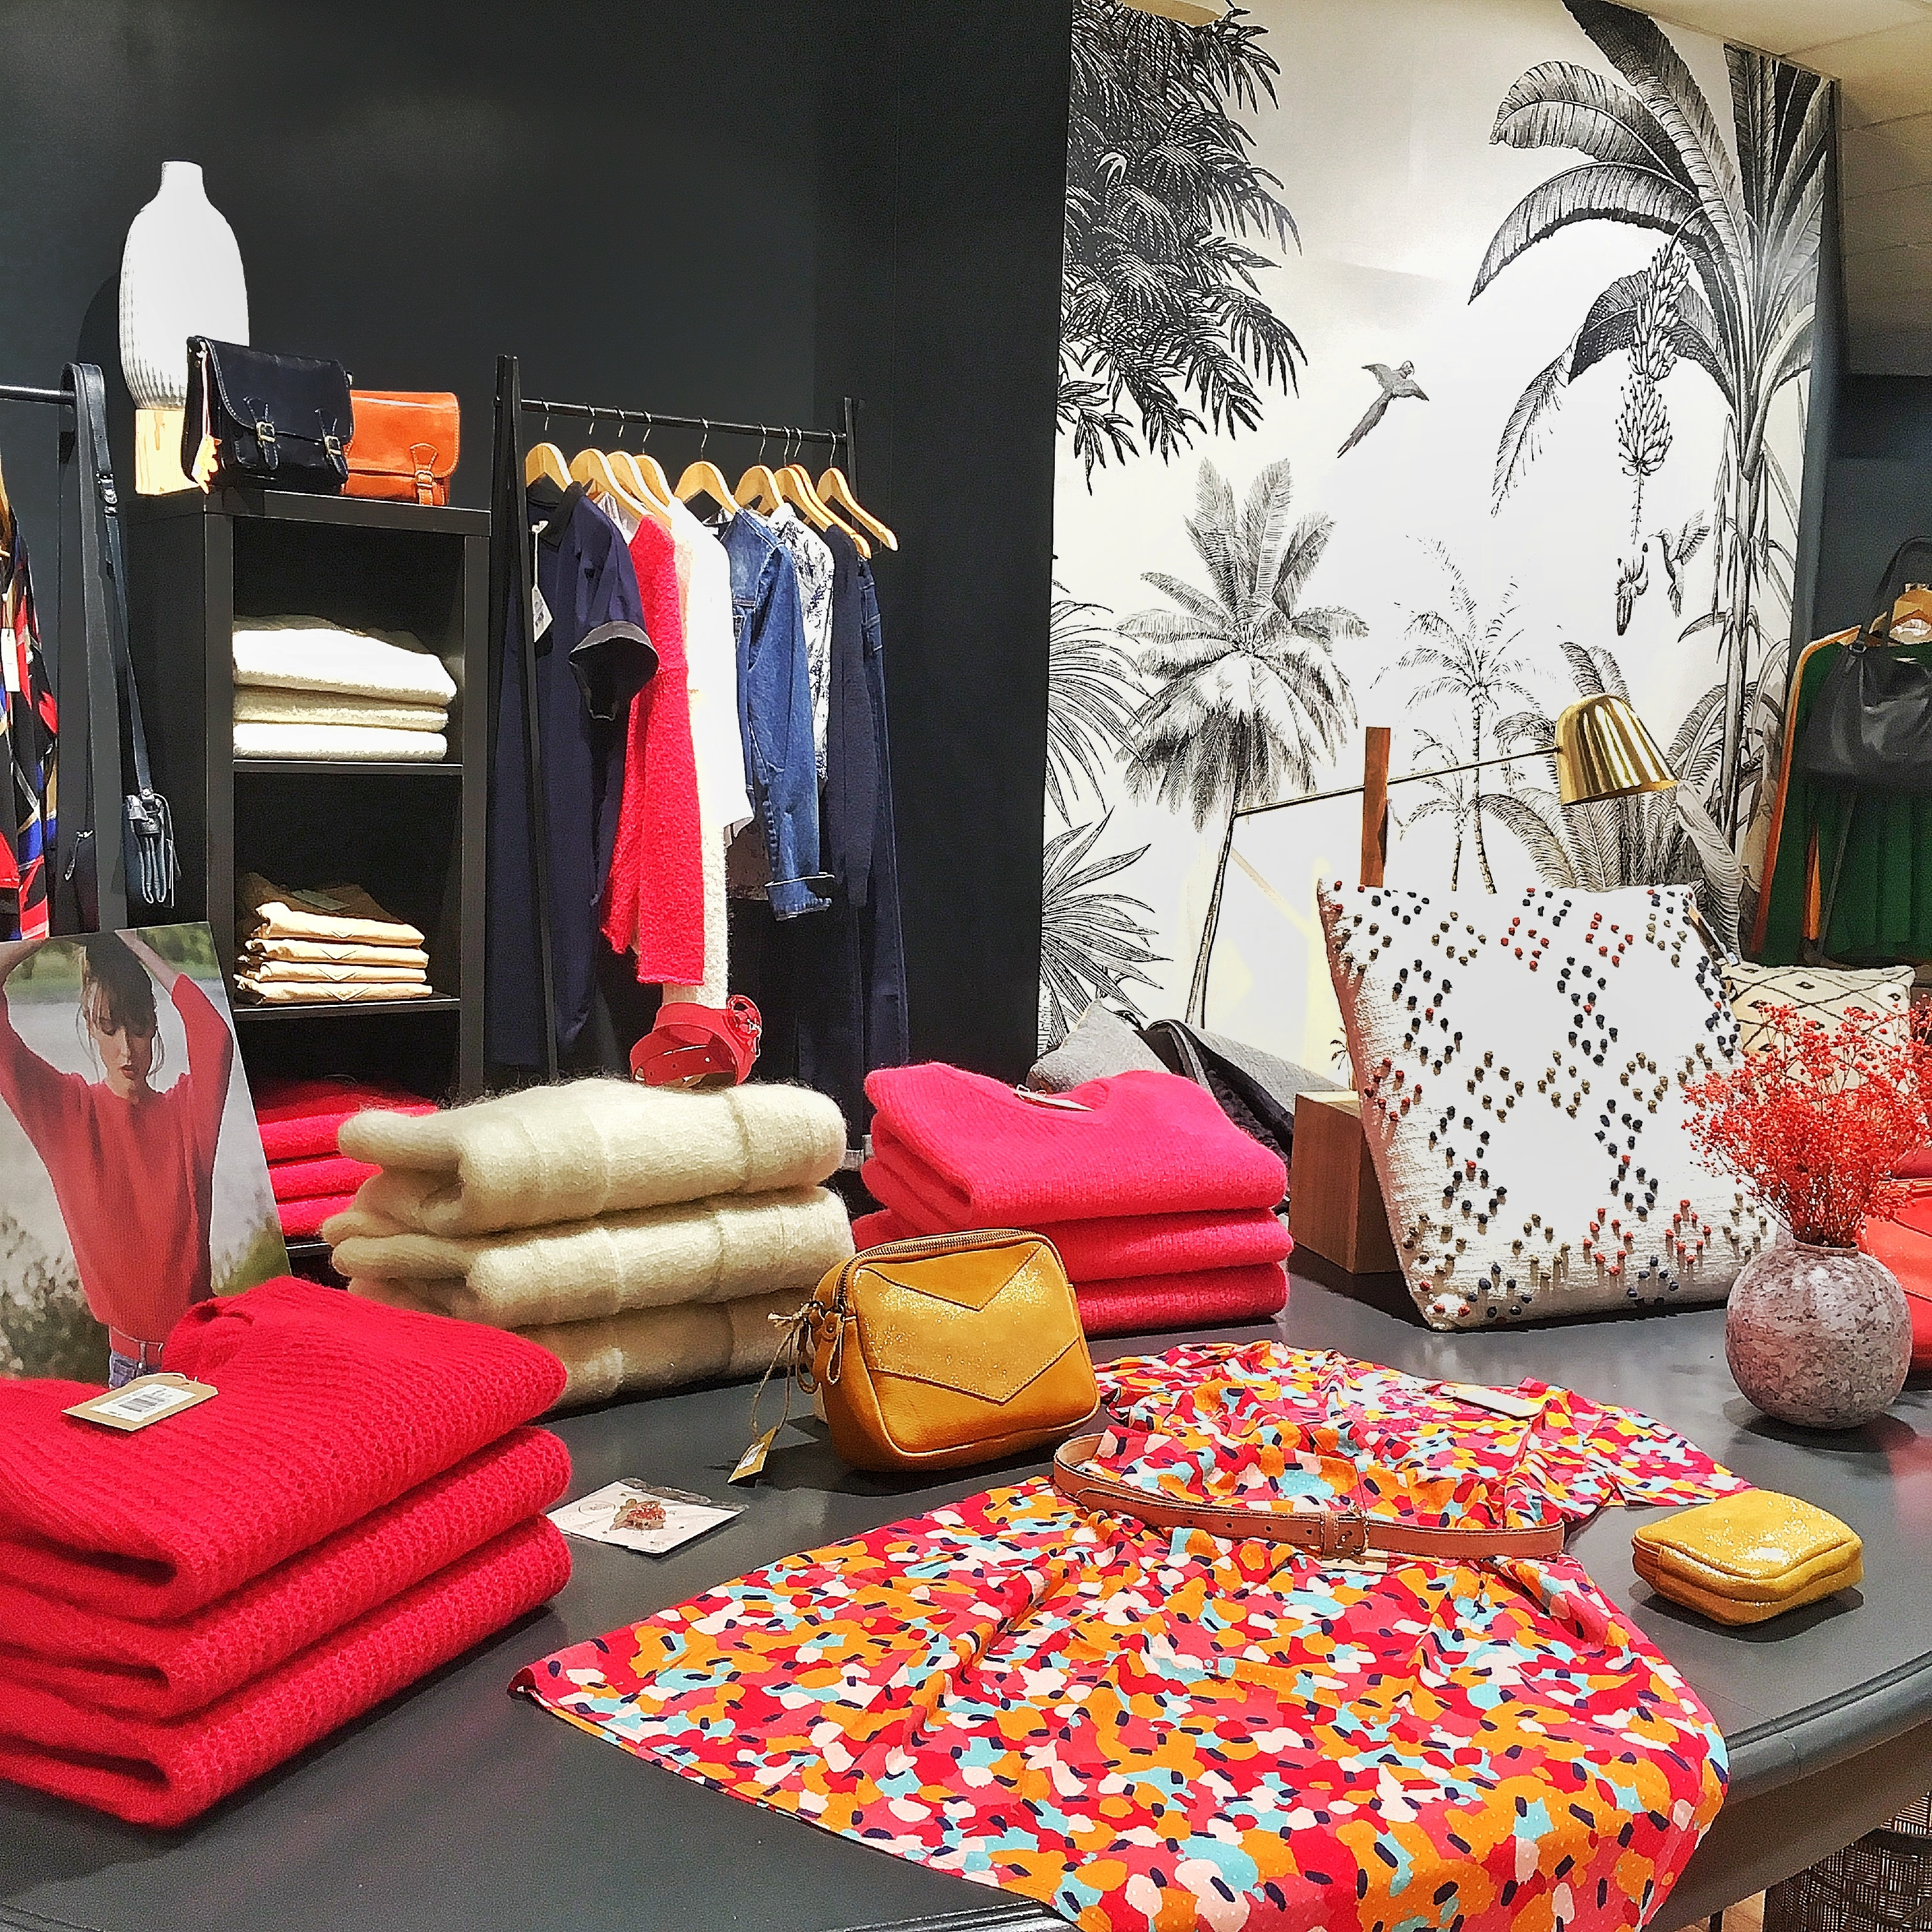 Galerie d'image - Adja boutique